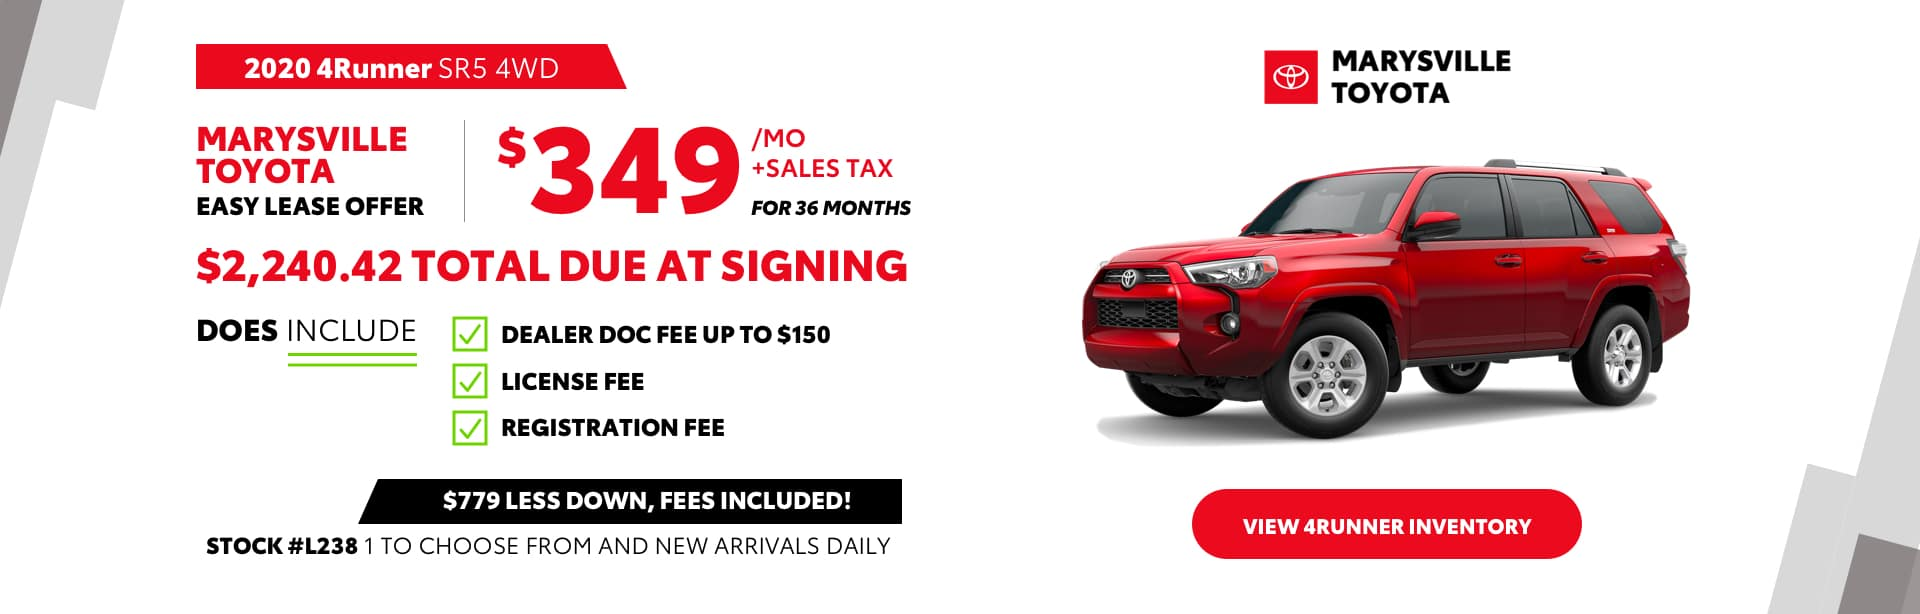 Marysville-Toyota-Easy-Lease-Offer